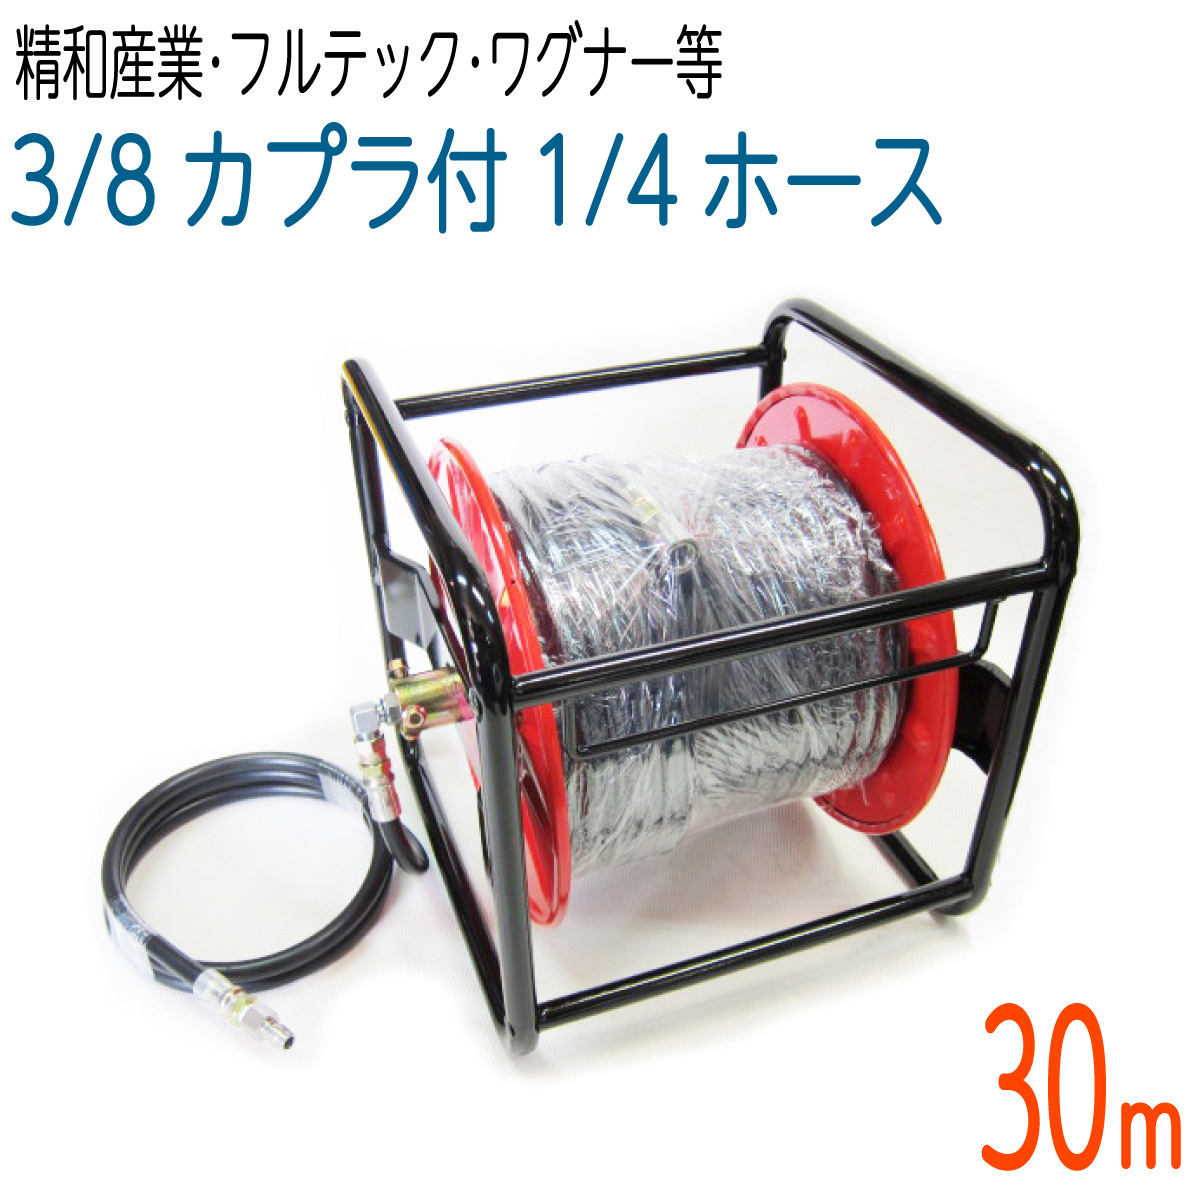 30Mリール巻き 推奨 1 4 2分 コンパクトホース 8 人気急上昇 3分 高圧洗浄機ホース 付 ワンタッチカプラ3